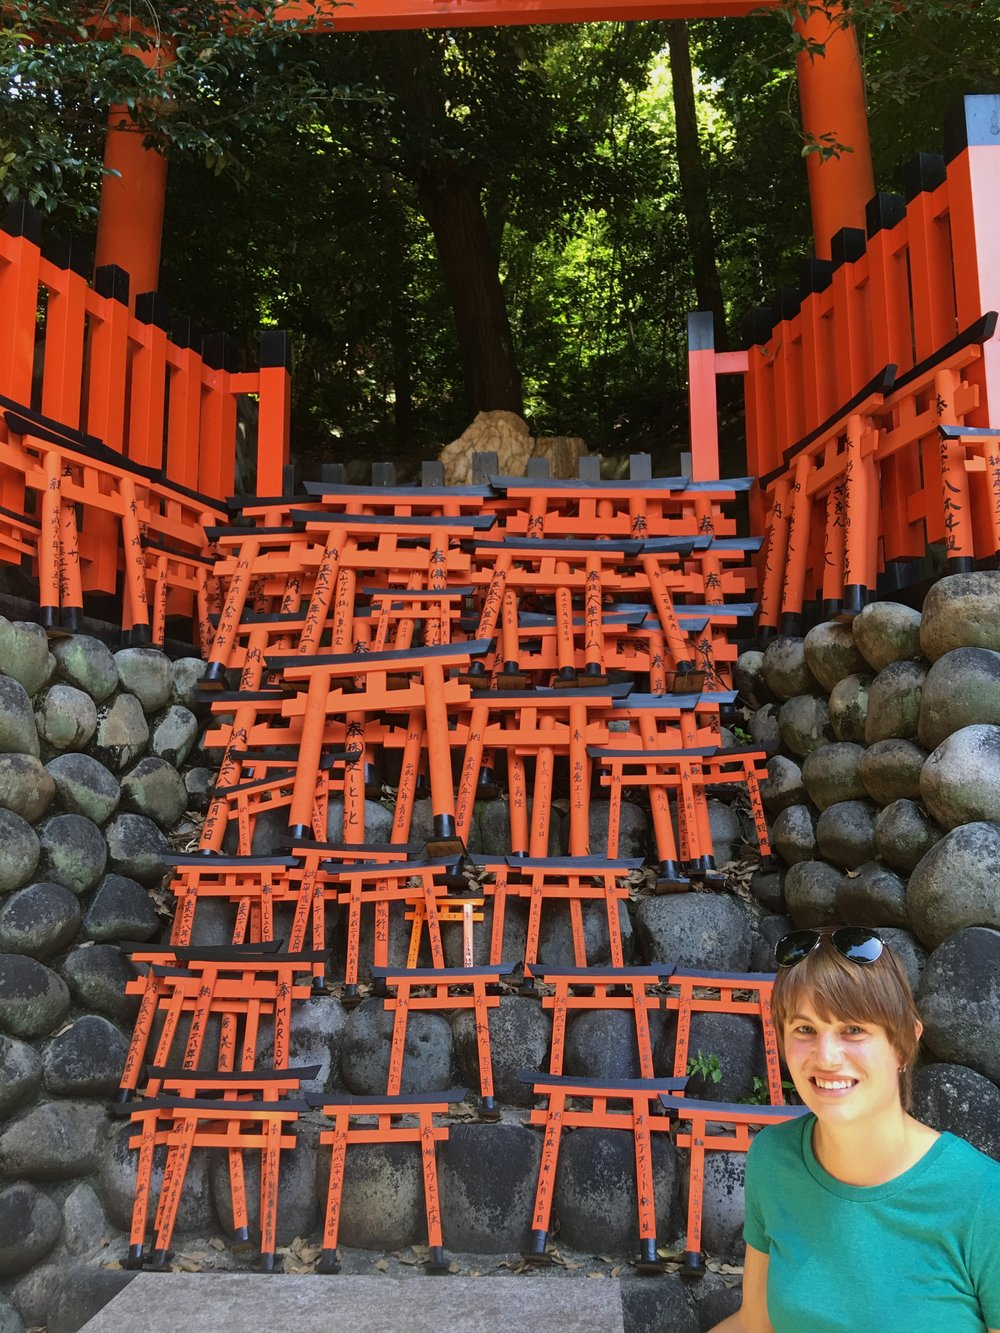 teri_Japan_Kyoto_FushimiInariTaisha_spiritedtable_photo05.jpg